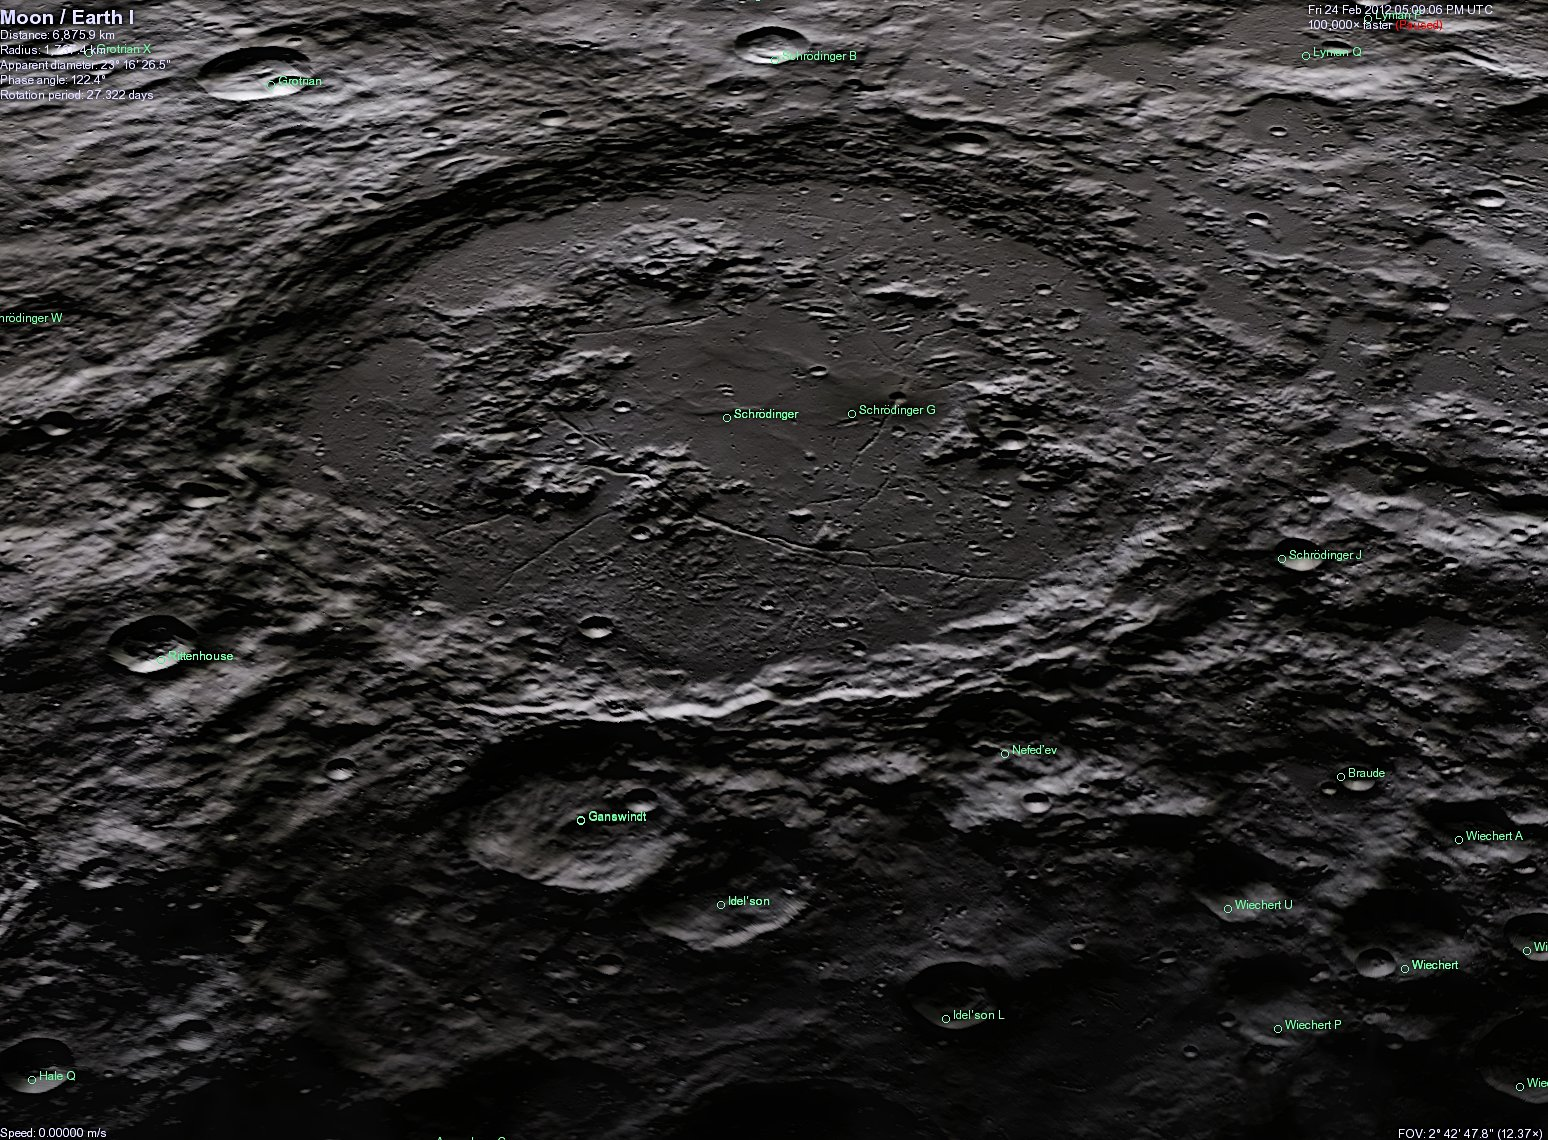 Alien Life China India - Chang e 2 High Res Moon Surface